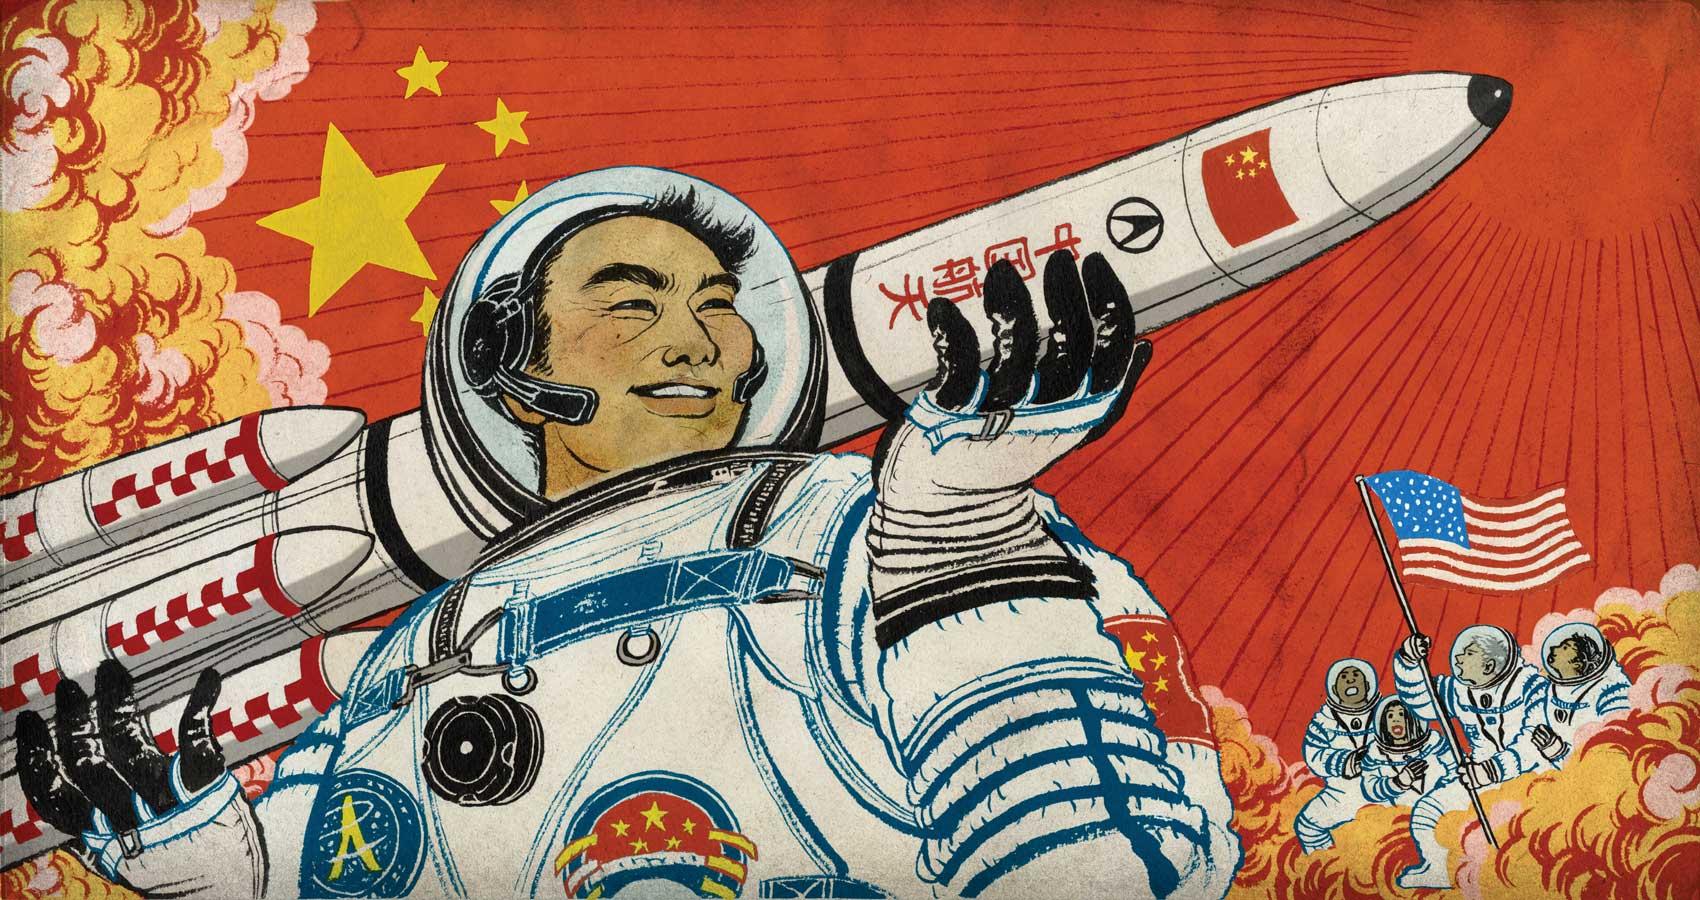 https://i0.wp.com/yukoart.com/wp-content/uploads/2016/10/Chinese_rocket_long_march.jpg